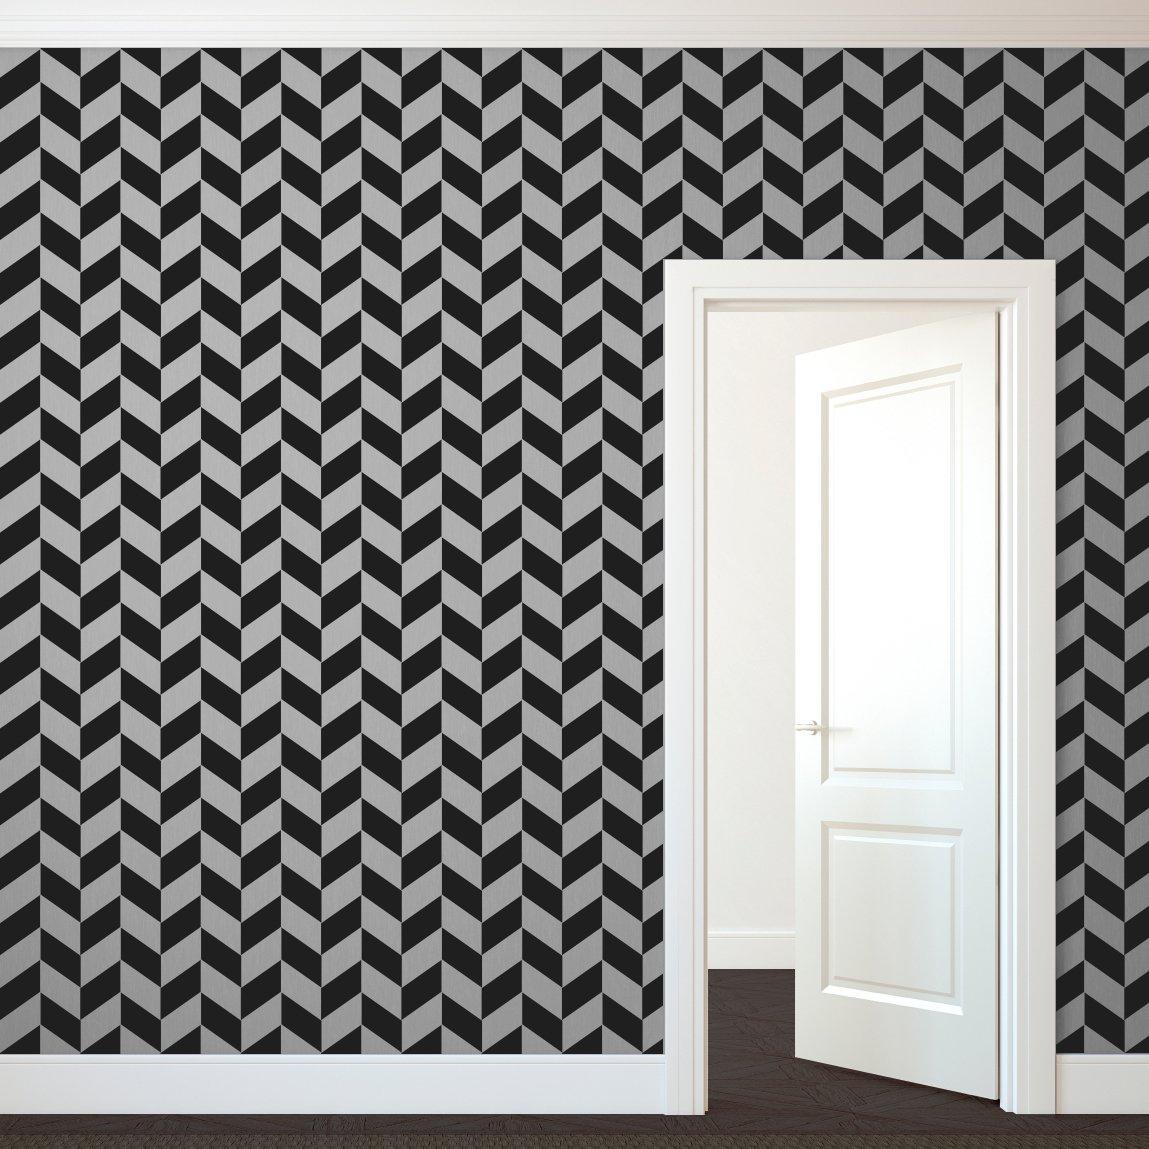 Modern Herringbone - Large - Custom Vinyl Wall Art Decal for Homes, Offices, Kids Rooms, Nurseries, Schools, High Schools, Colleges, Universities, Interior Designers, Architects, Remodelers